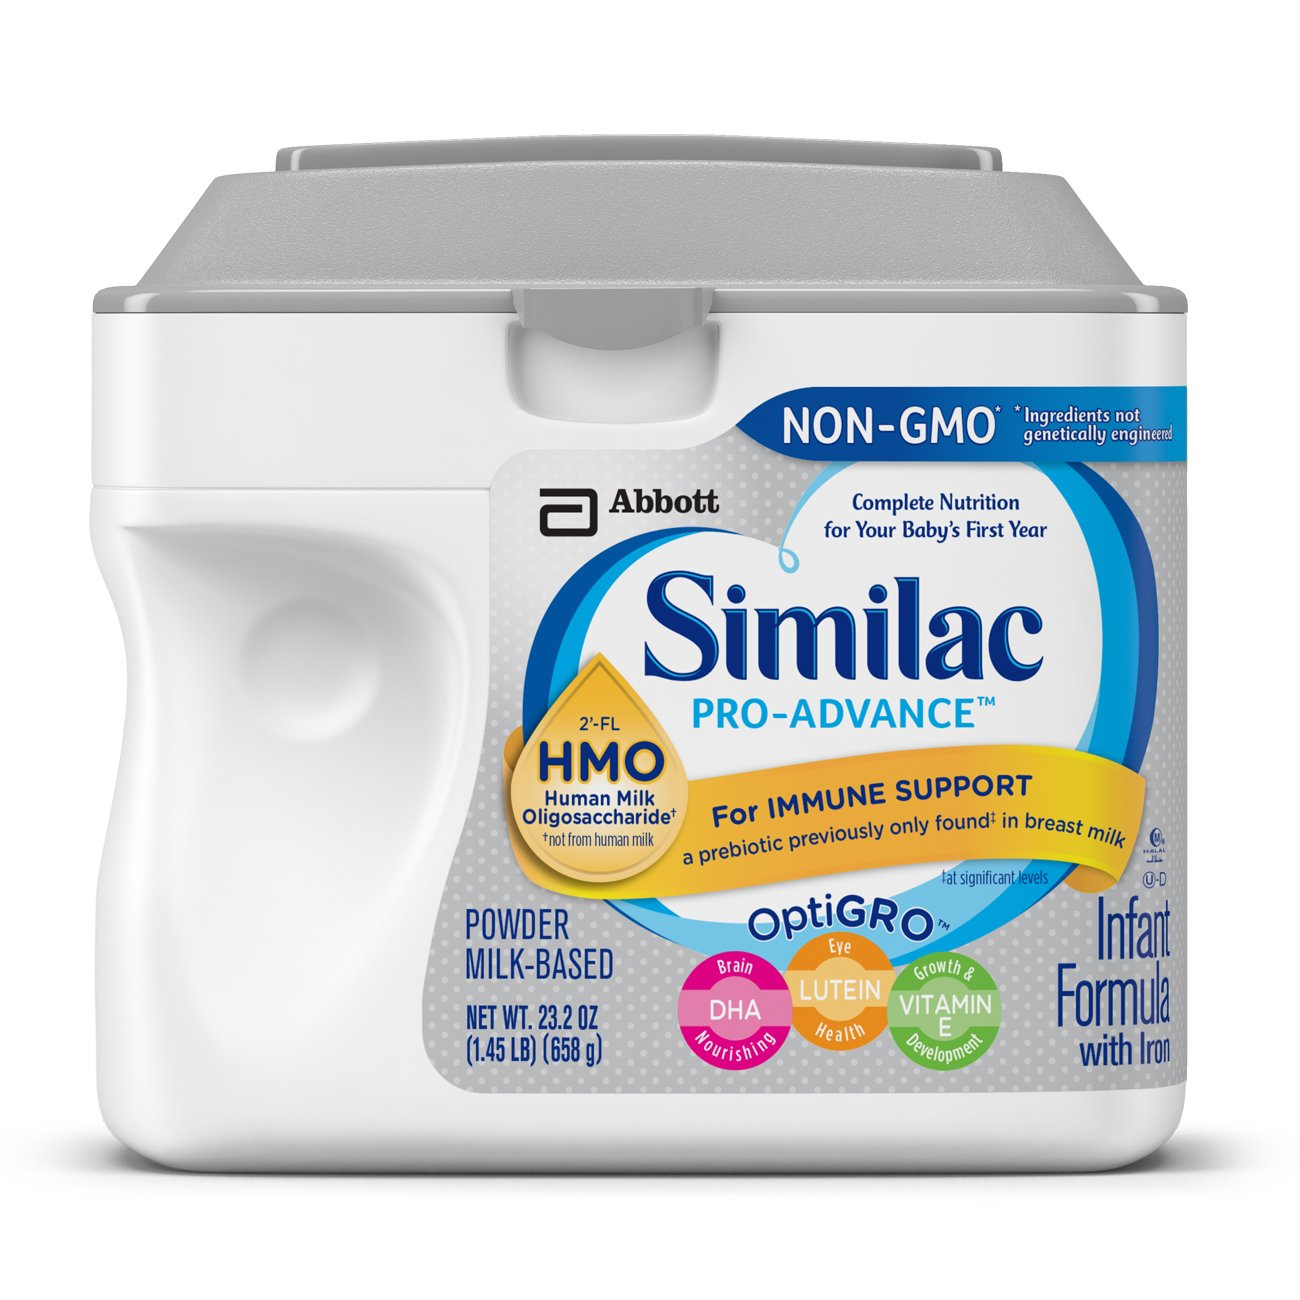 Similac Pro-Advance Infant Formula with 2'-FL HMO for Immune Support Powder, 23.2 oz